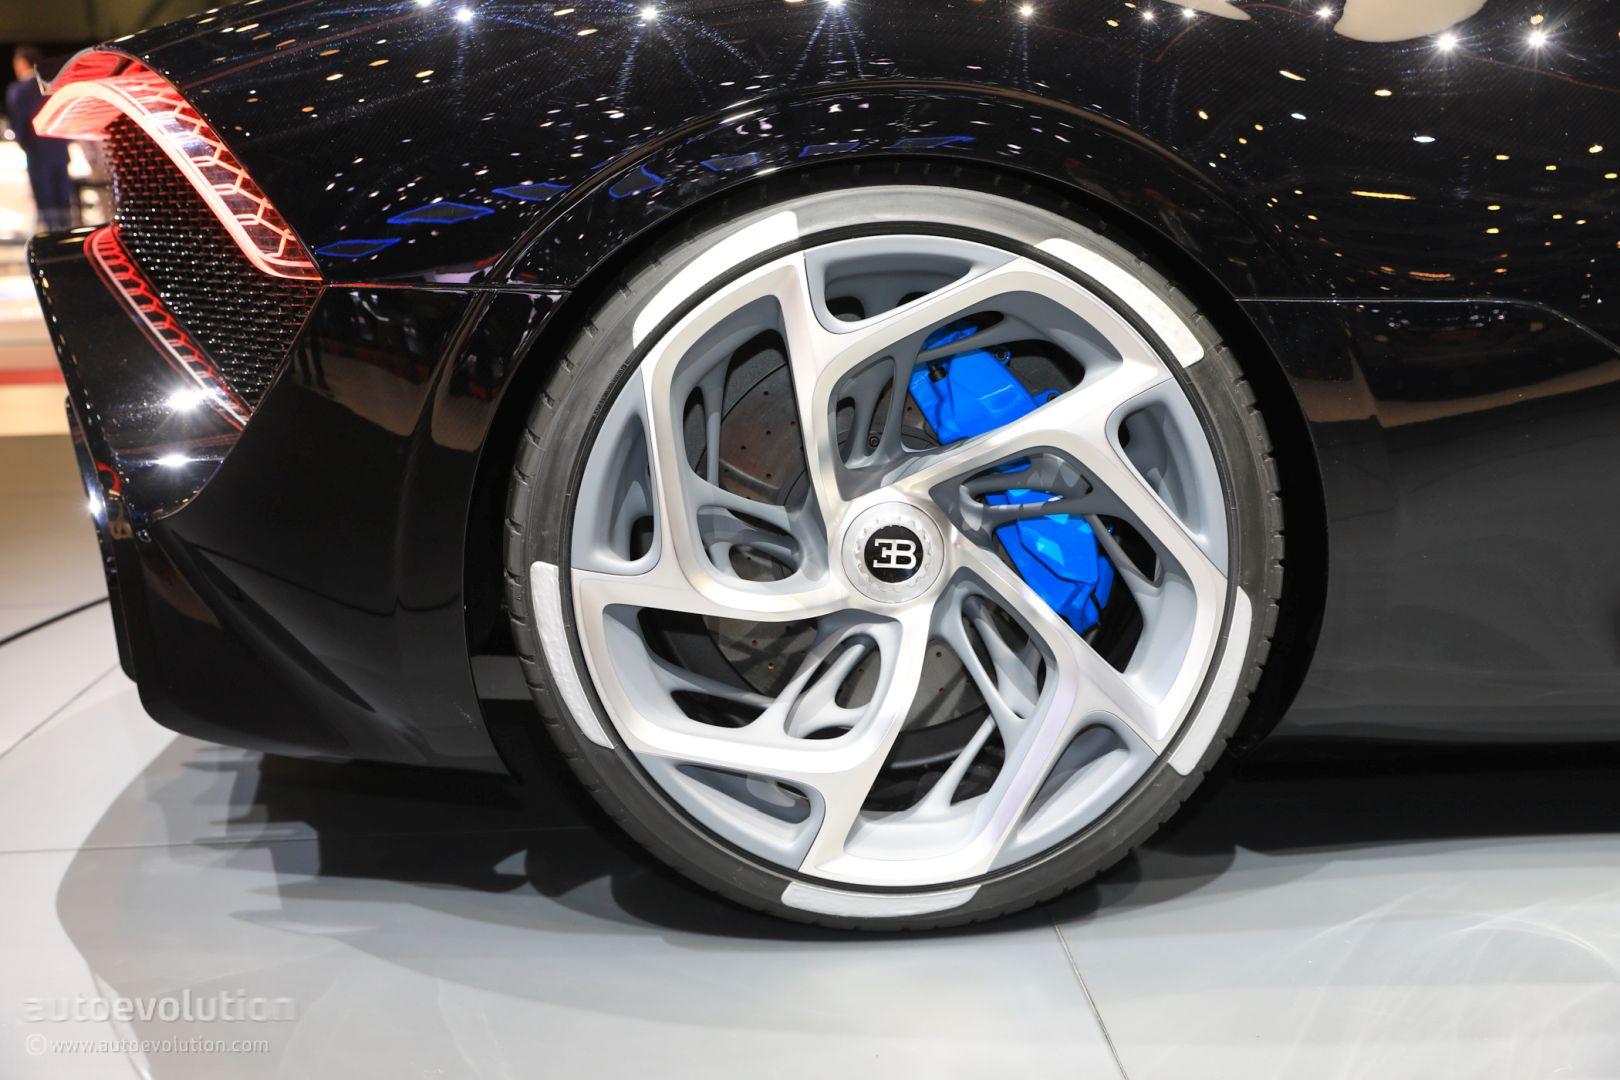 The Most Expensive Car In The World >> UPDATE: $19M Bugatti La Voiture Noire Geneva Car Is a Mockup, Production in 2022 - autoevolution